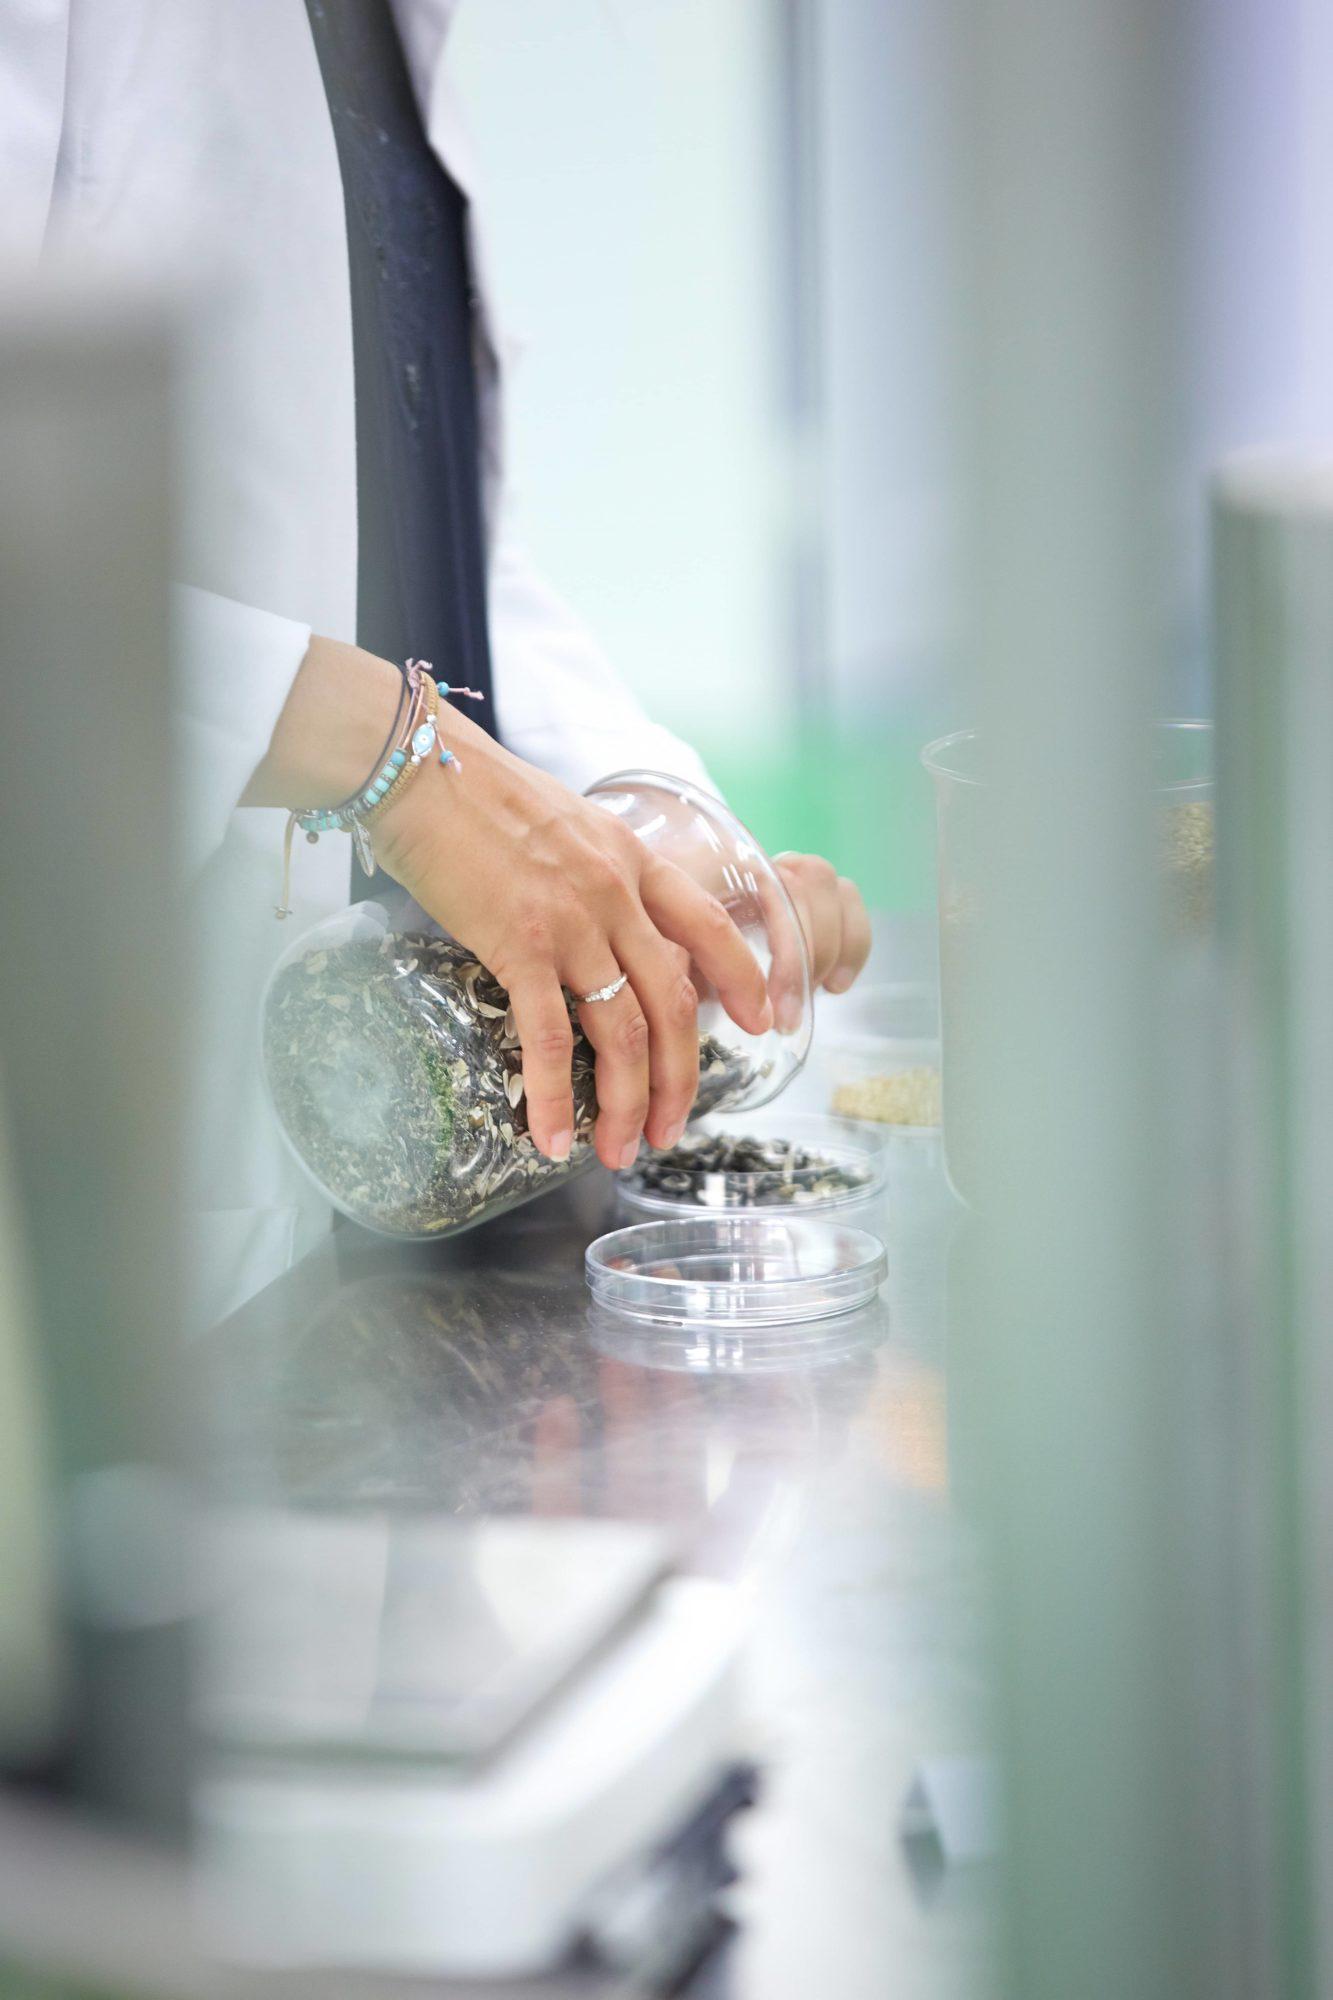 extraction végétale